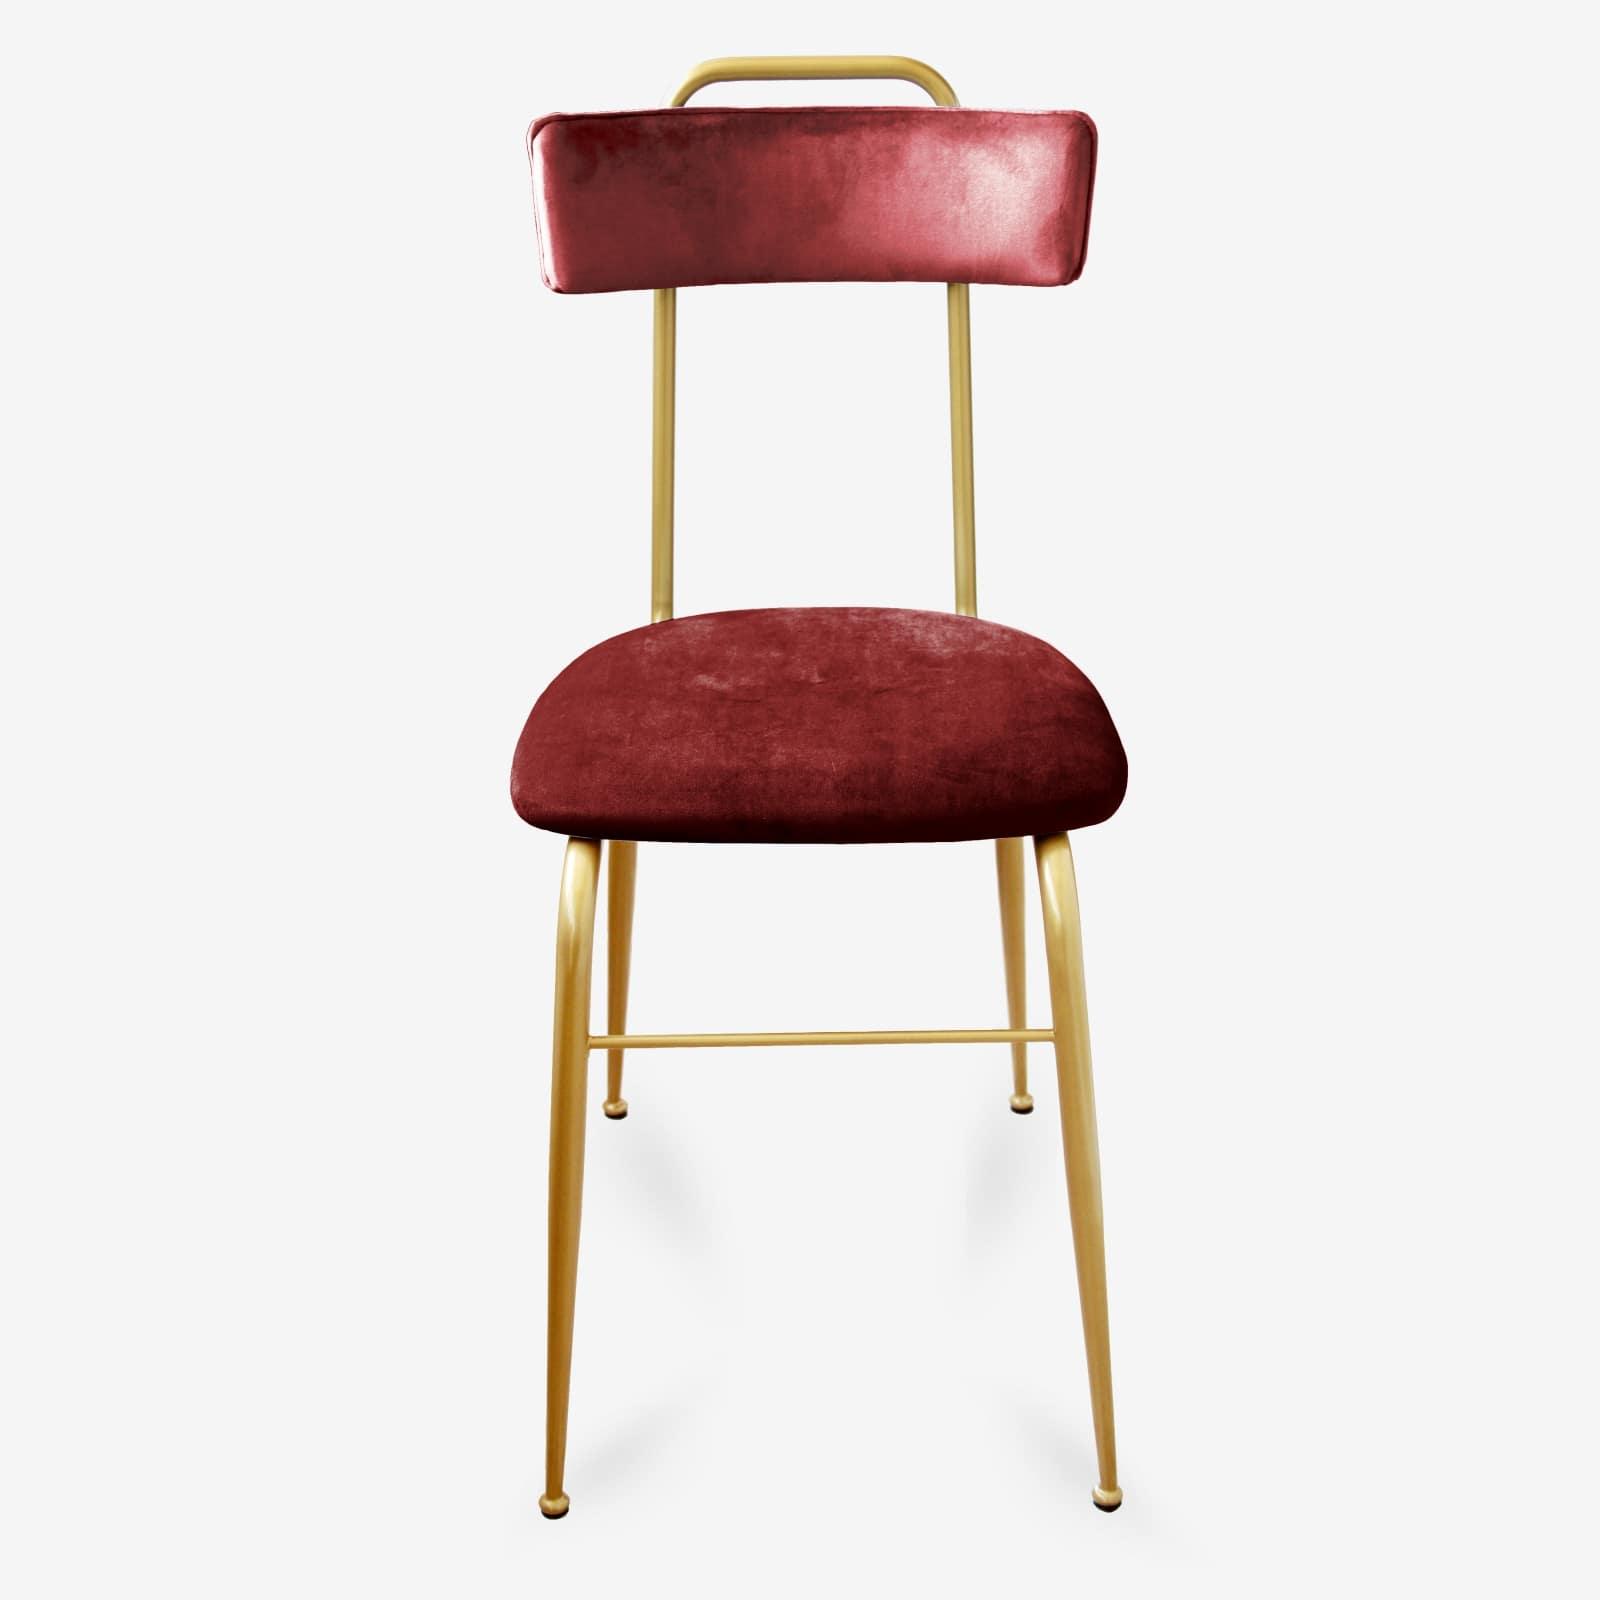 Sedia in Velluto bordò stile Vintage con gambe in Metallo - CLOE -